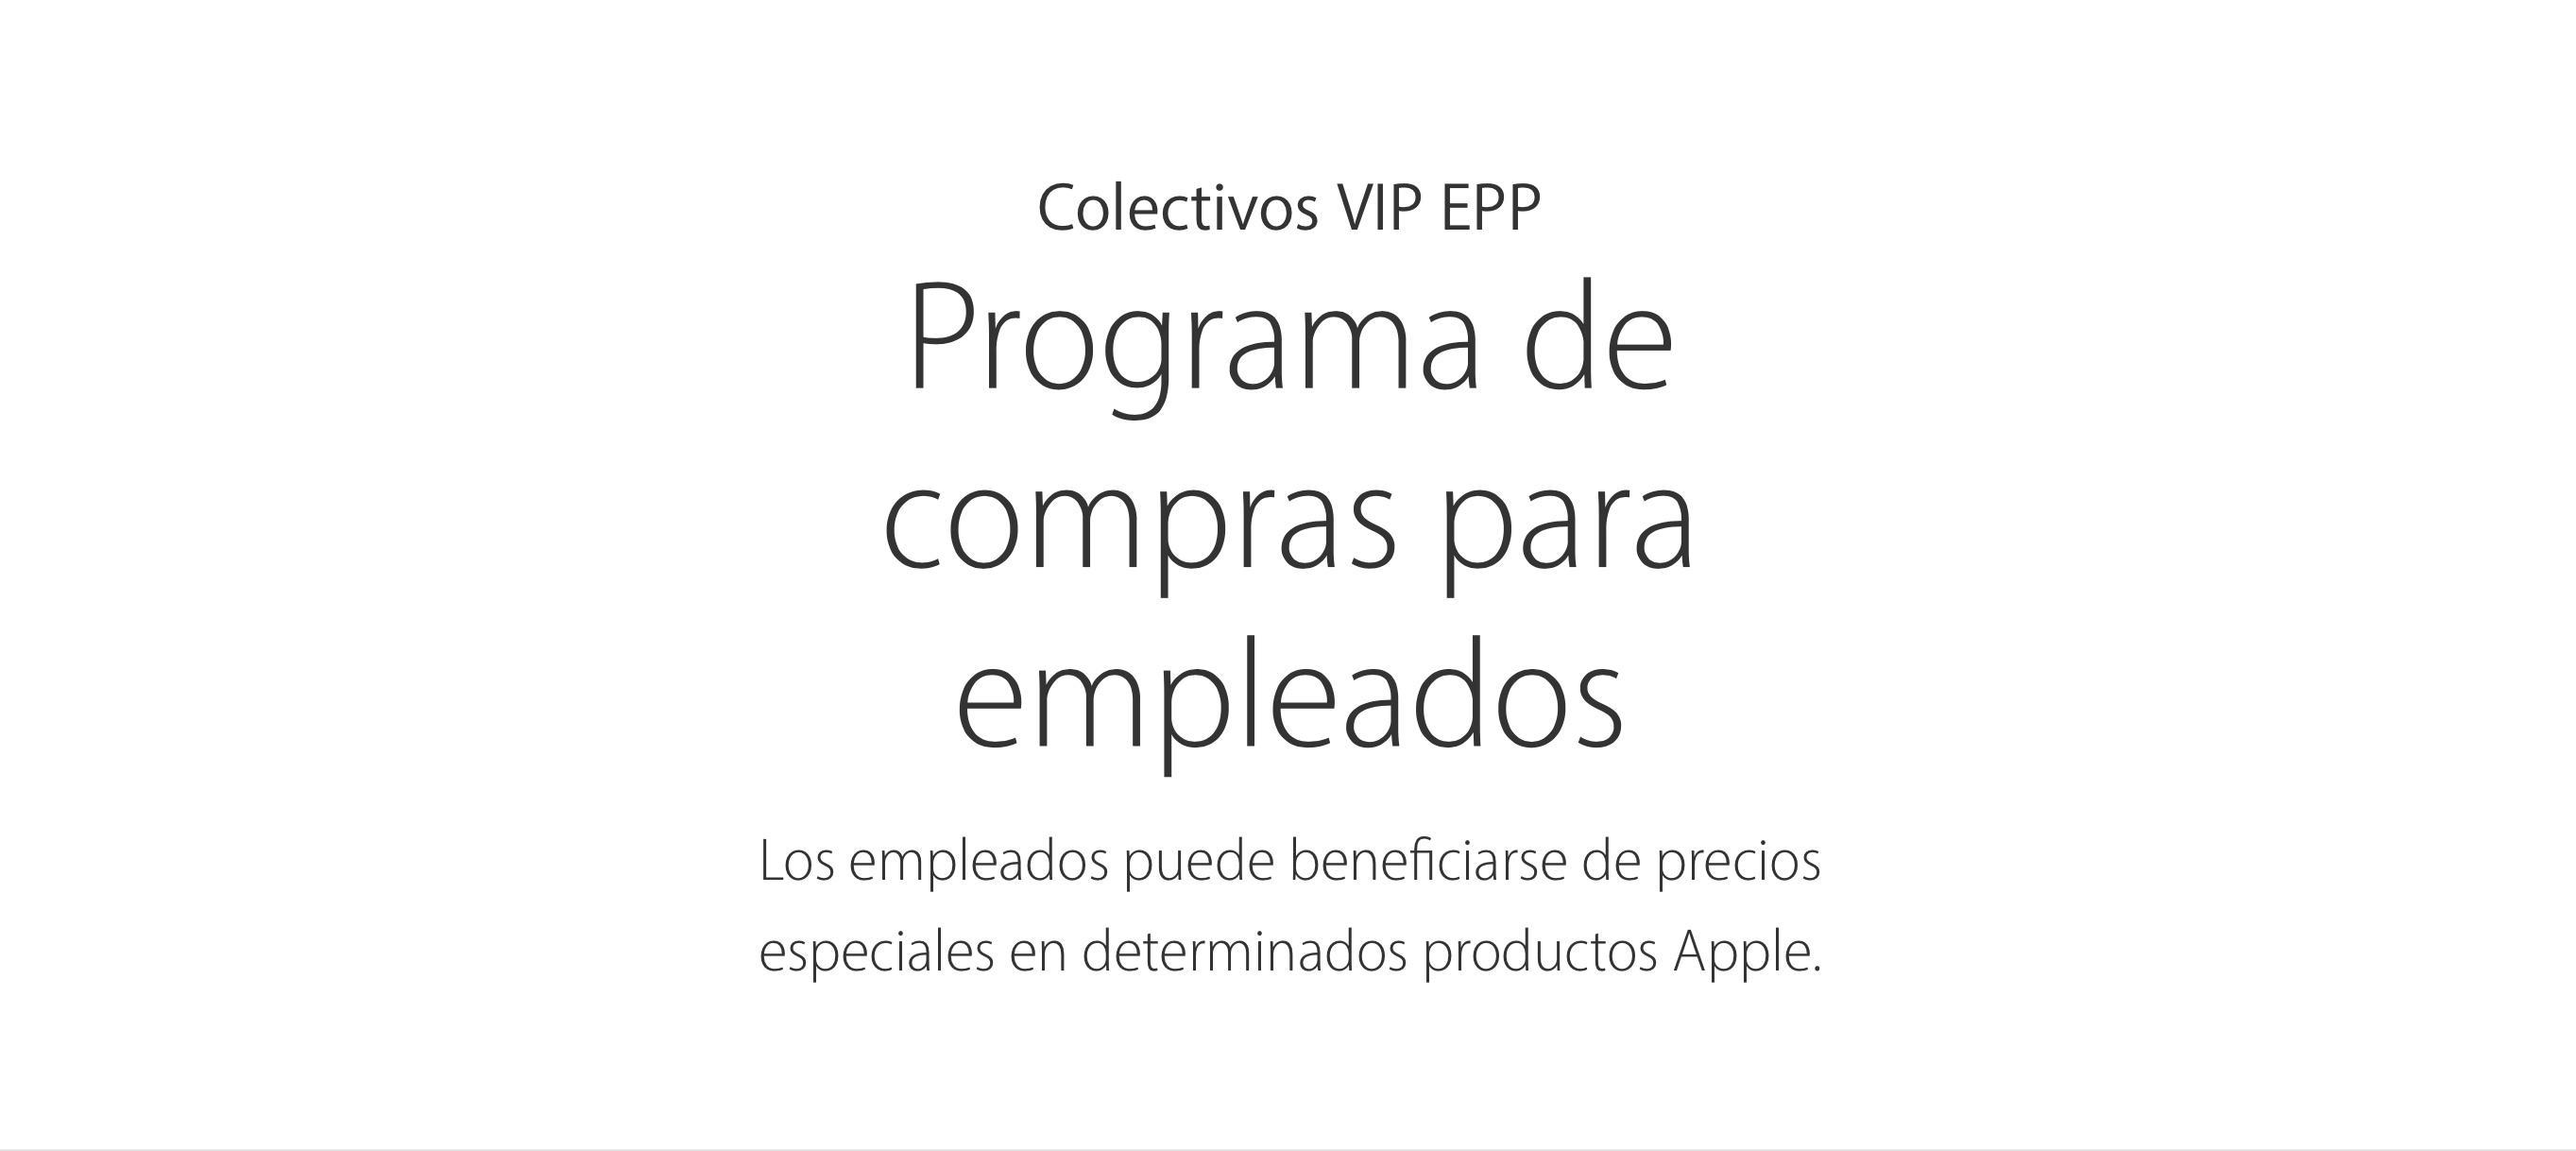 Colectivos VIP Apple